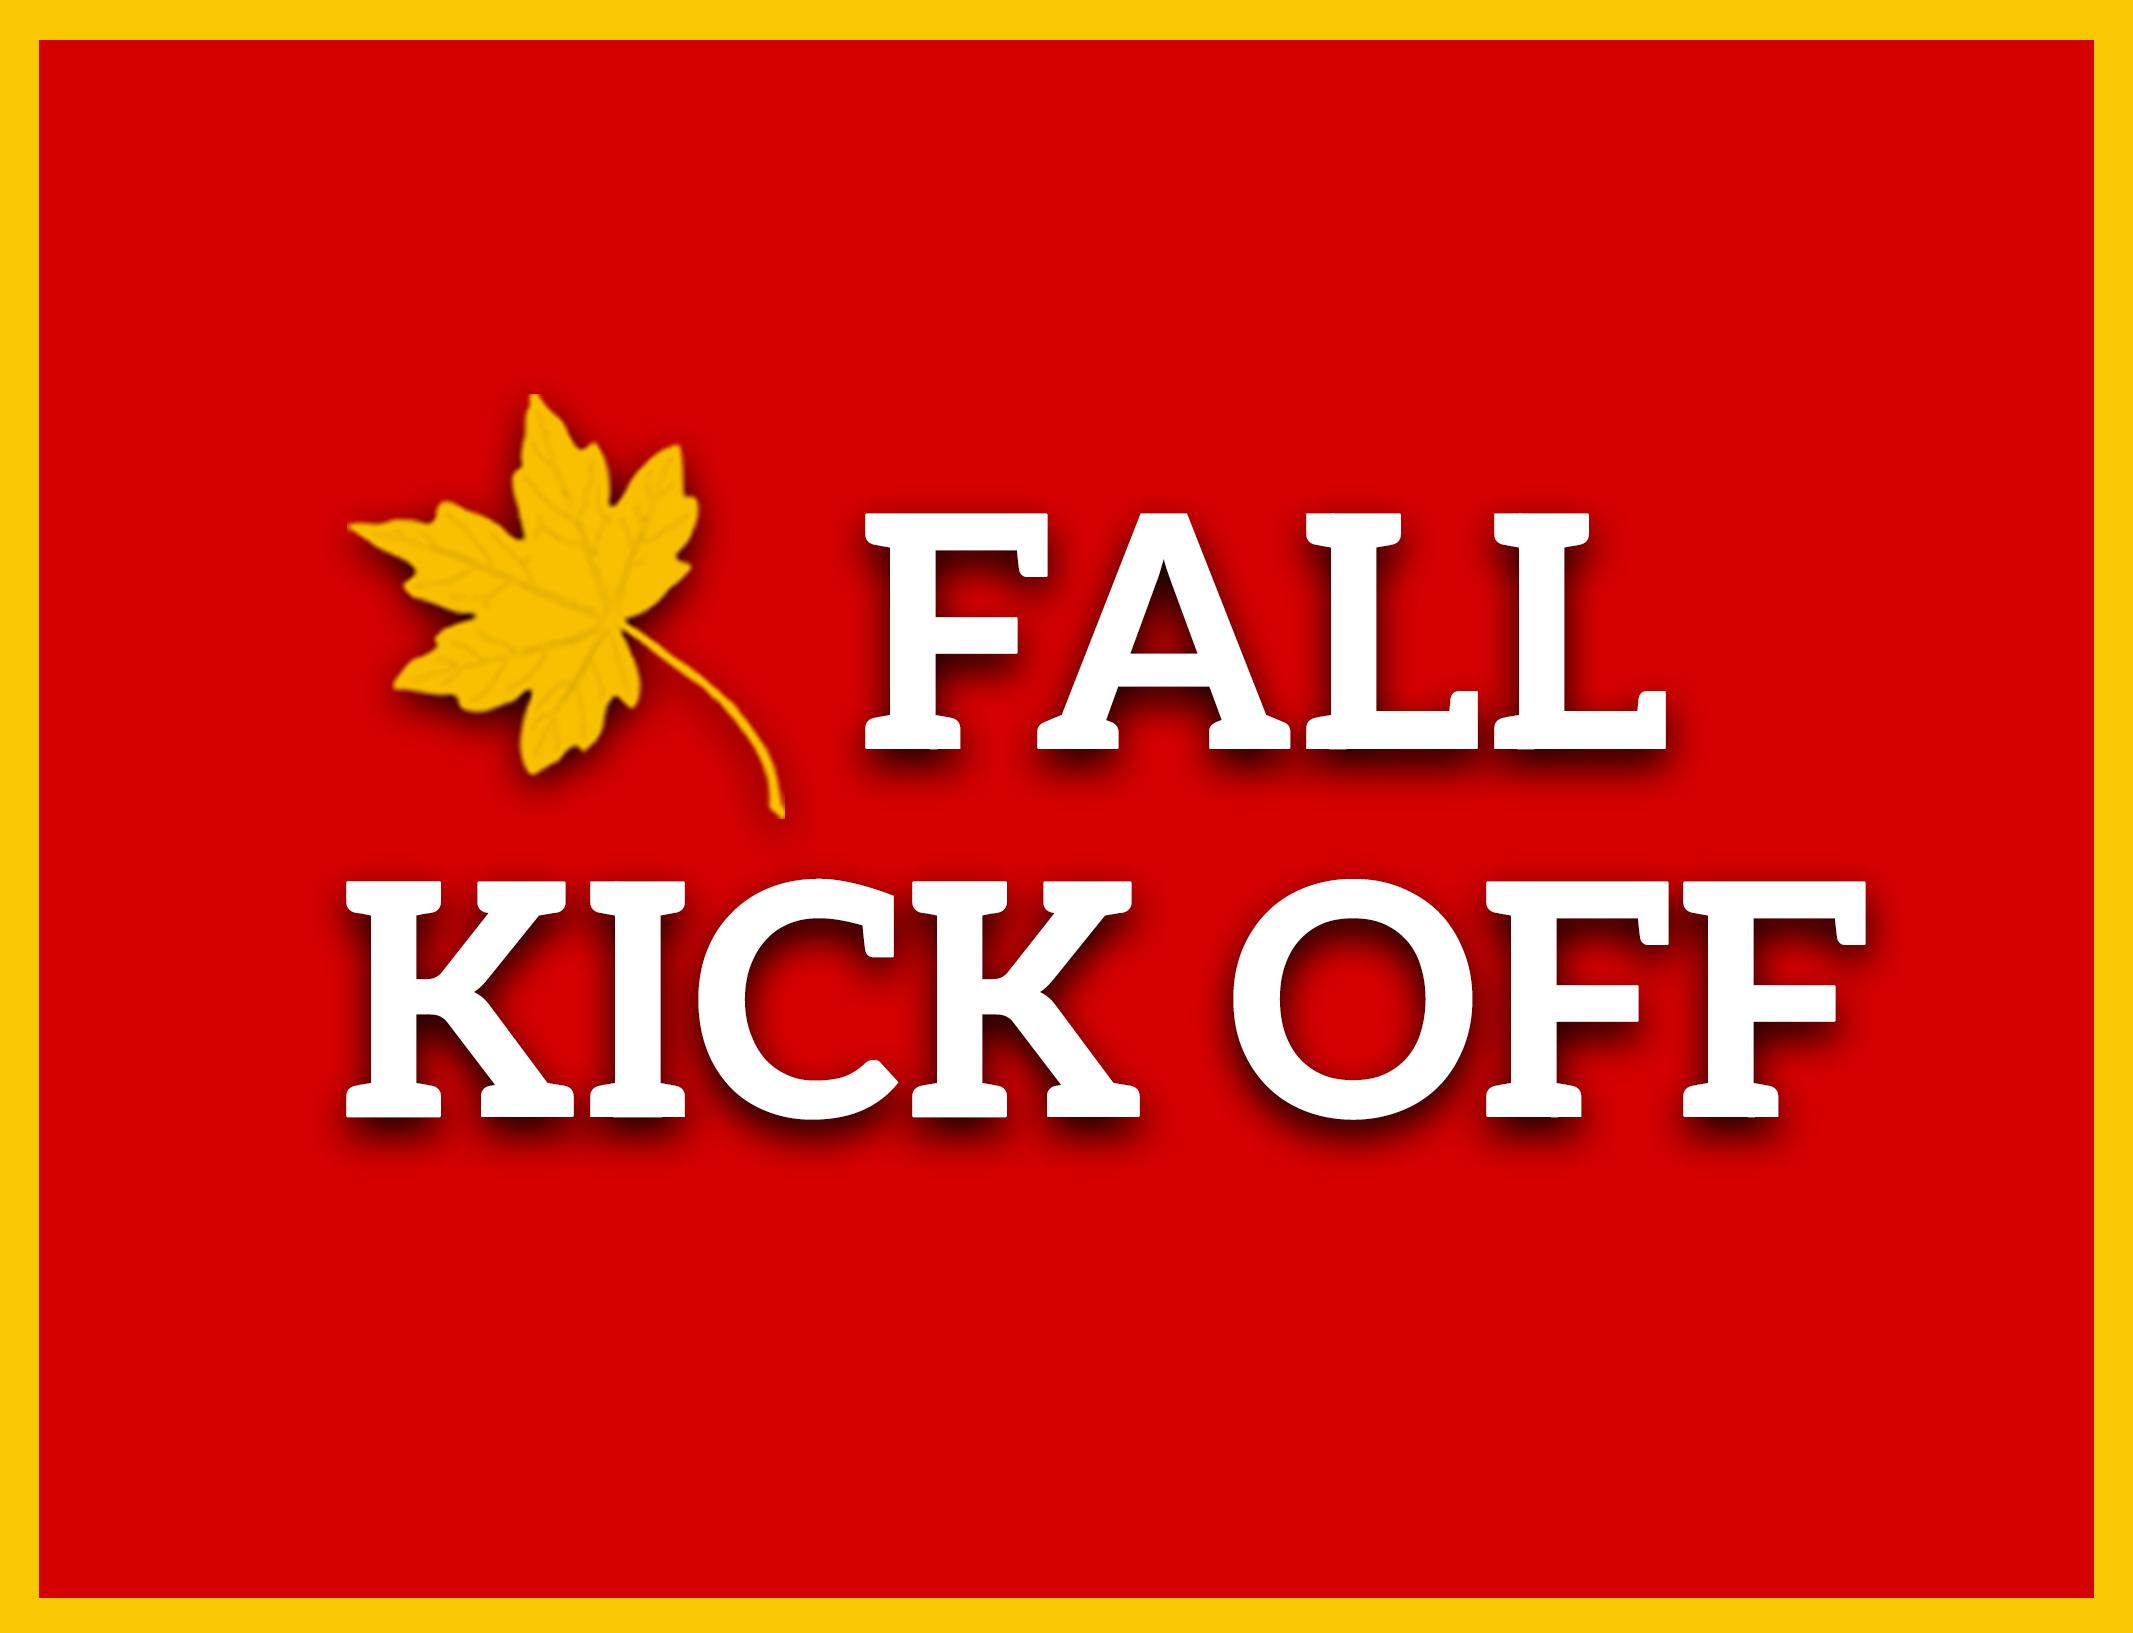 Fall kick off 2017 pco registration